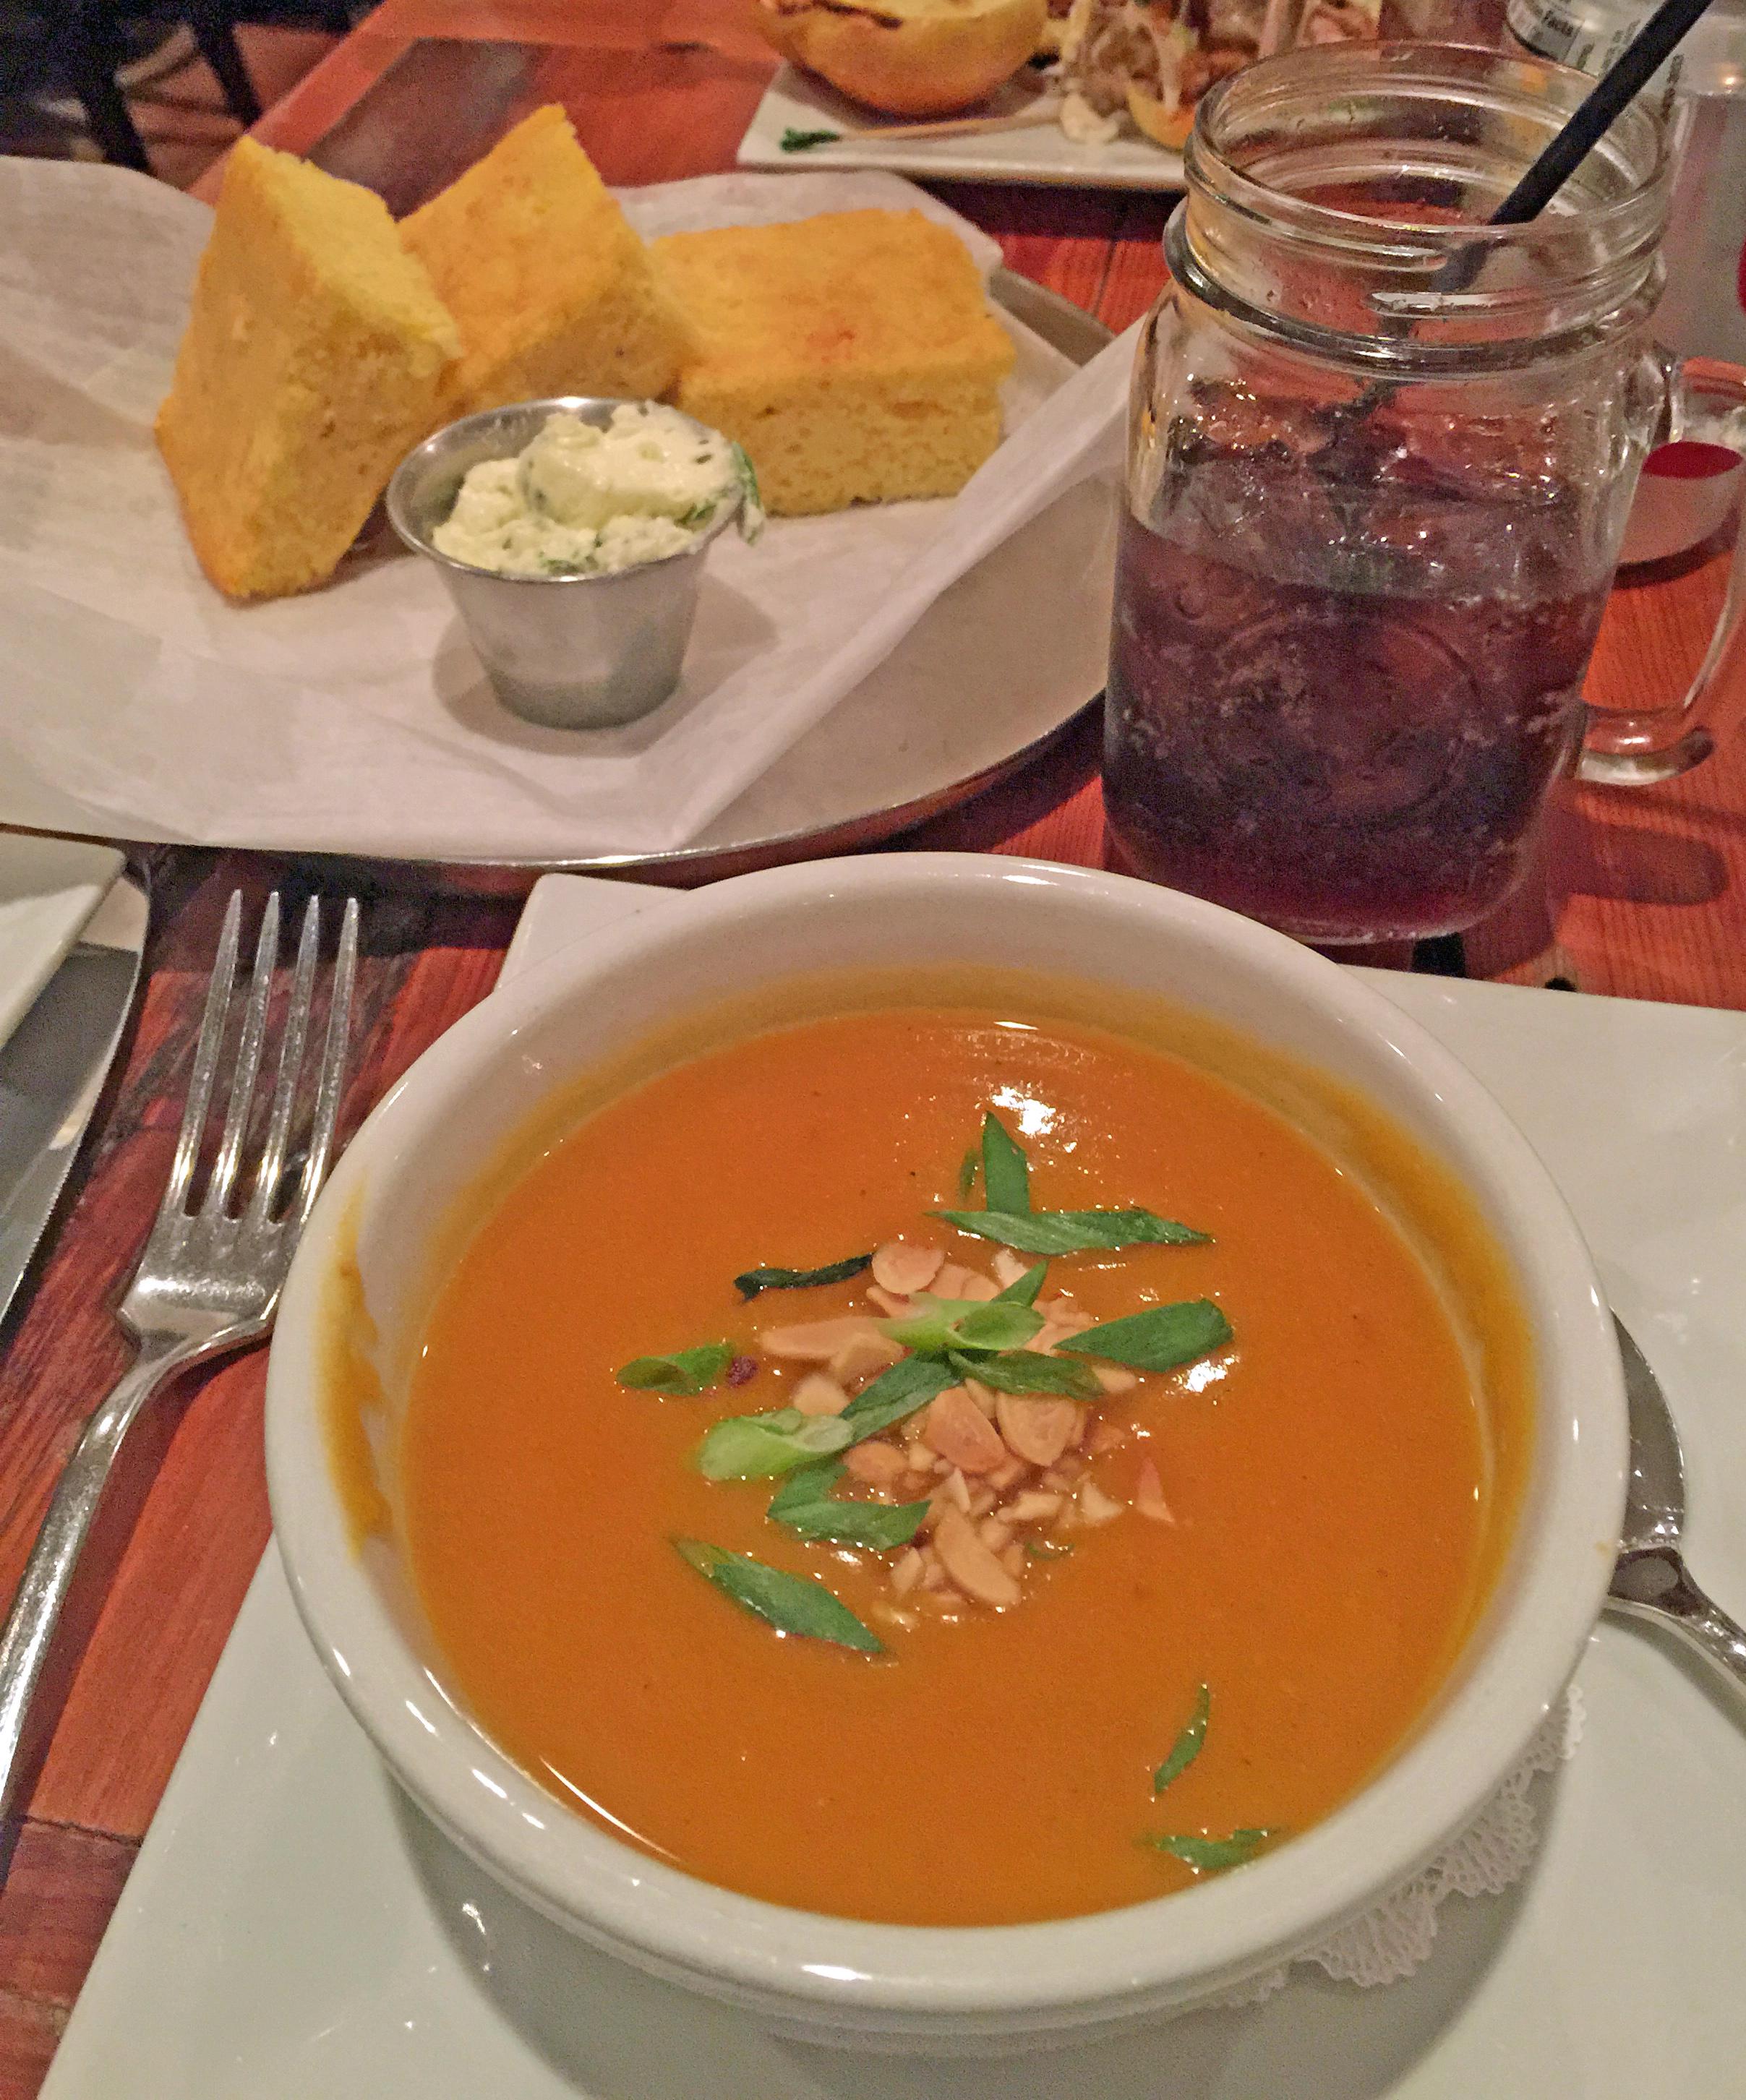 Warm homemade Corn bread and Butternut Squash Soup